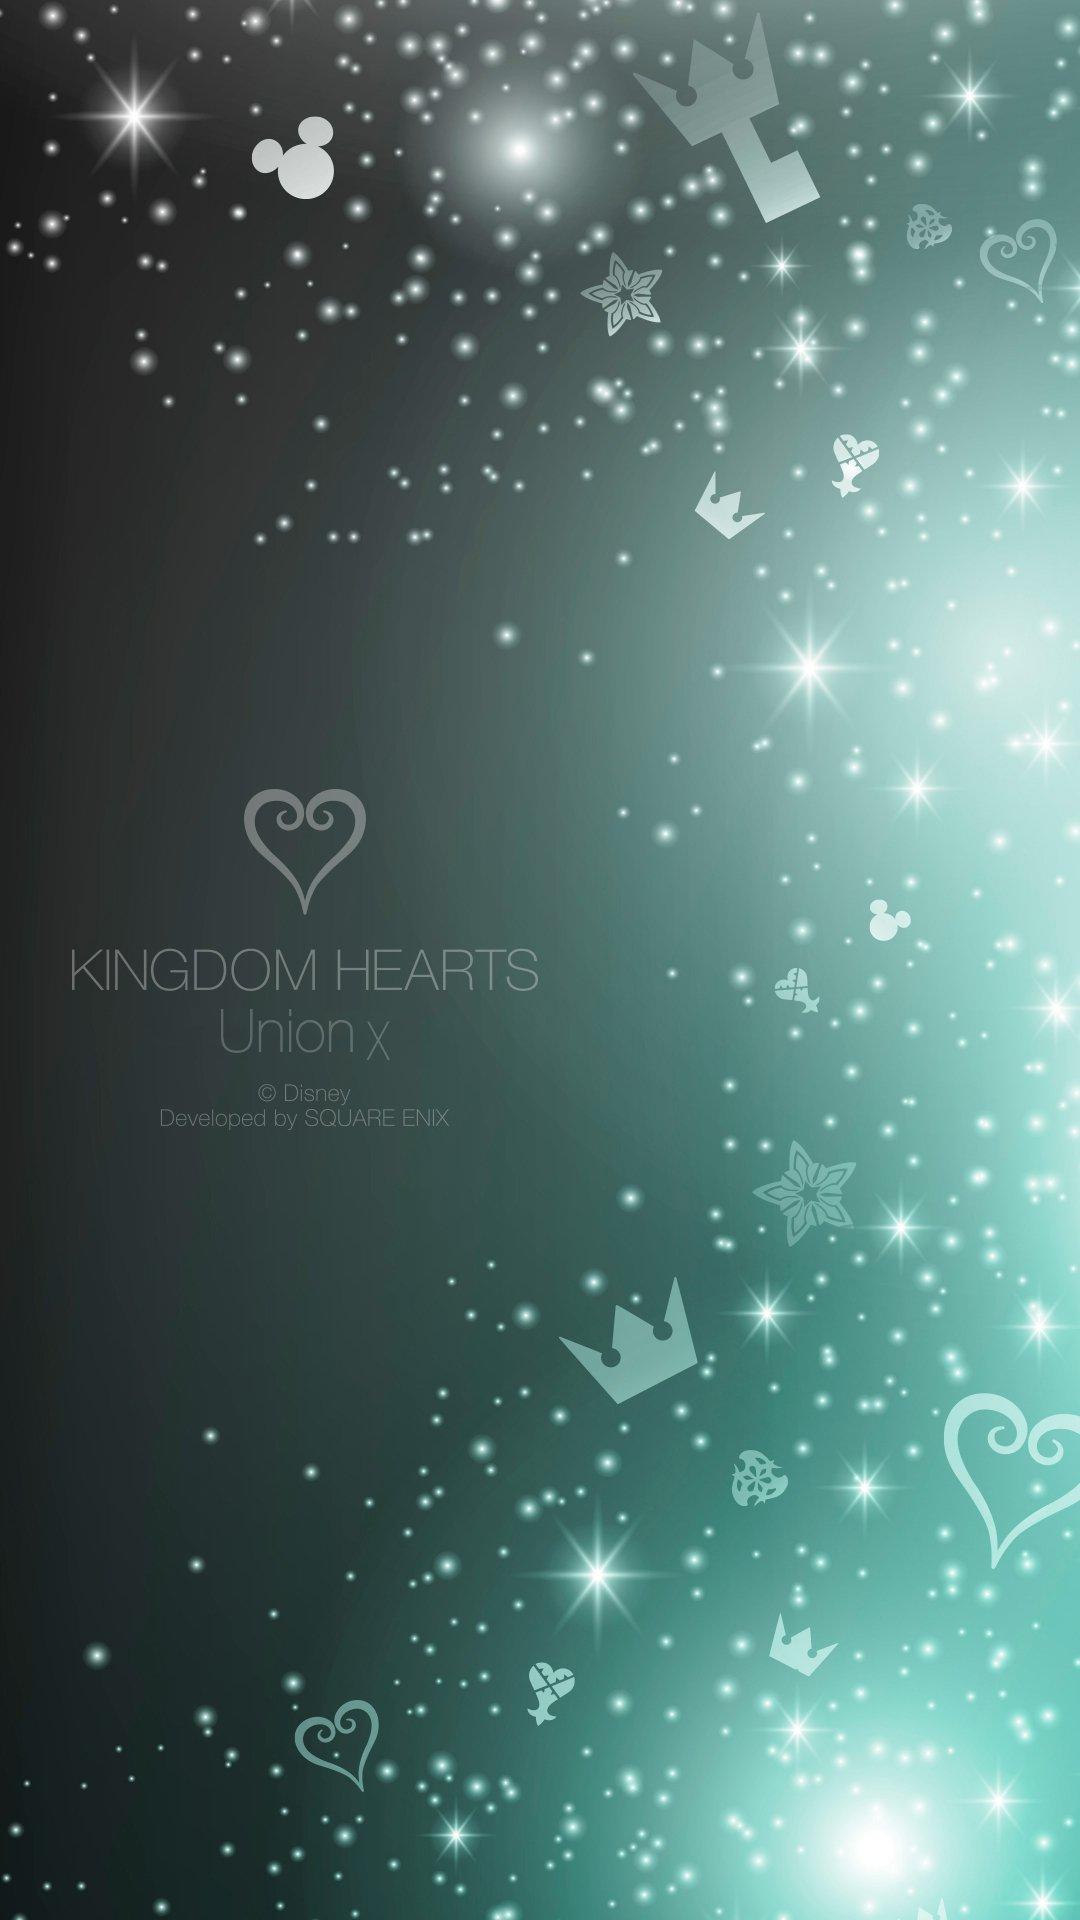 Wallpapers Kingdom Hearts Union X Cross Kingdom Hearts Insider